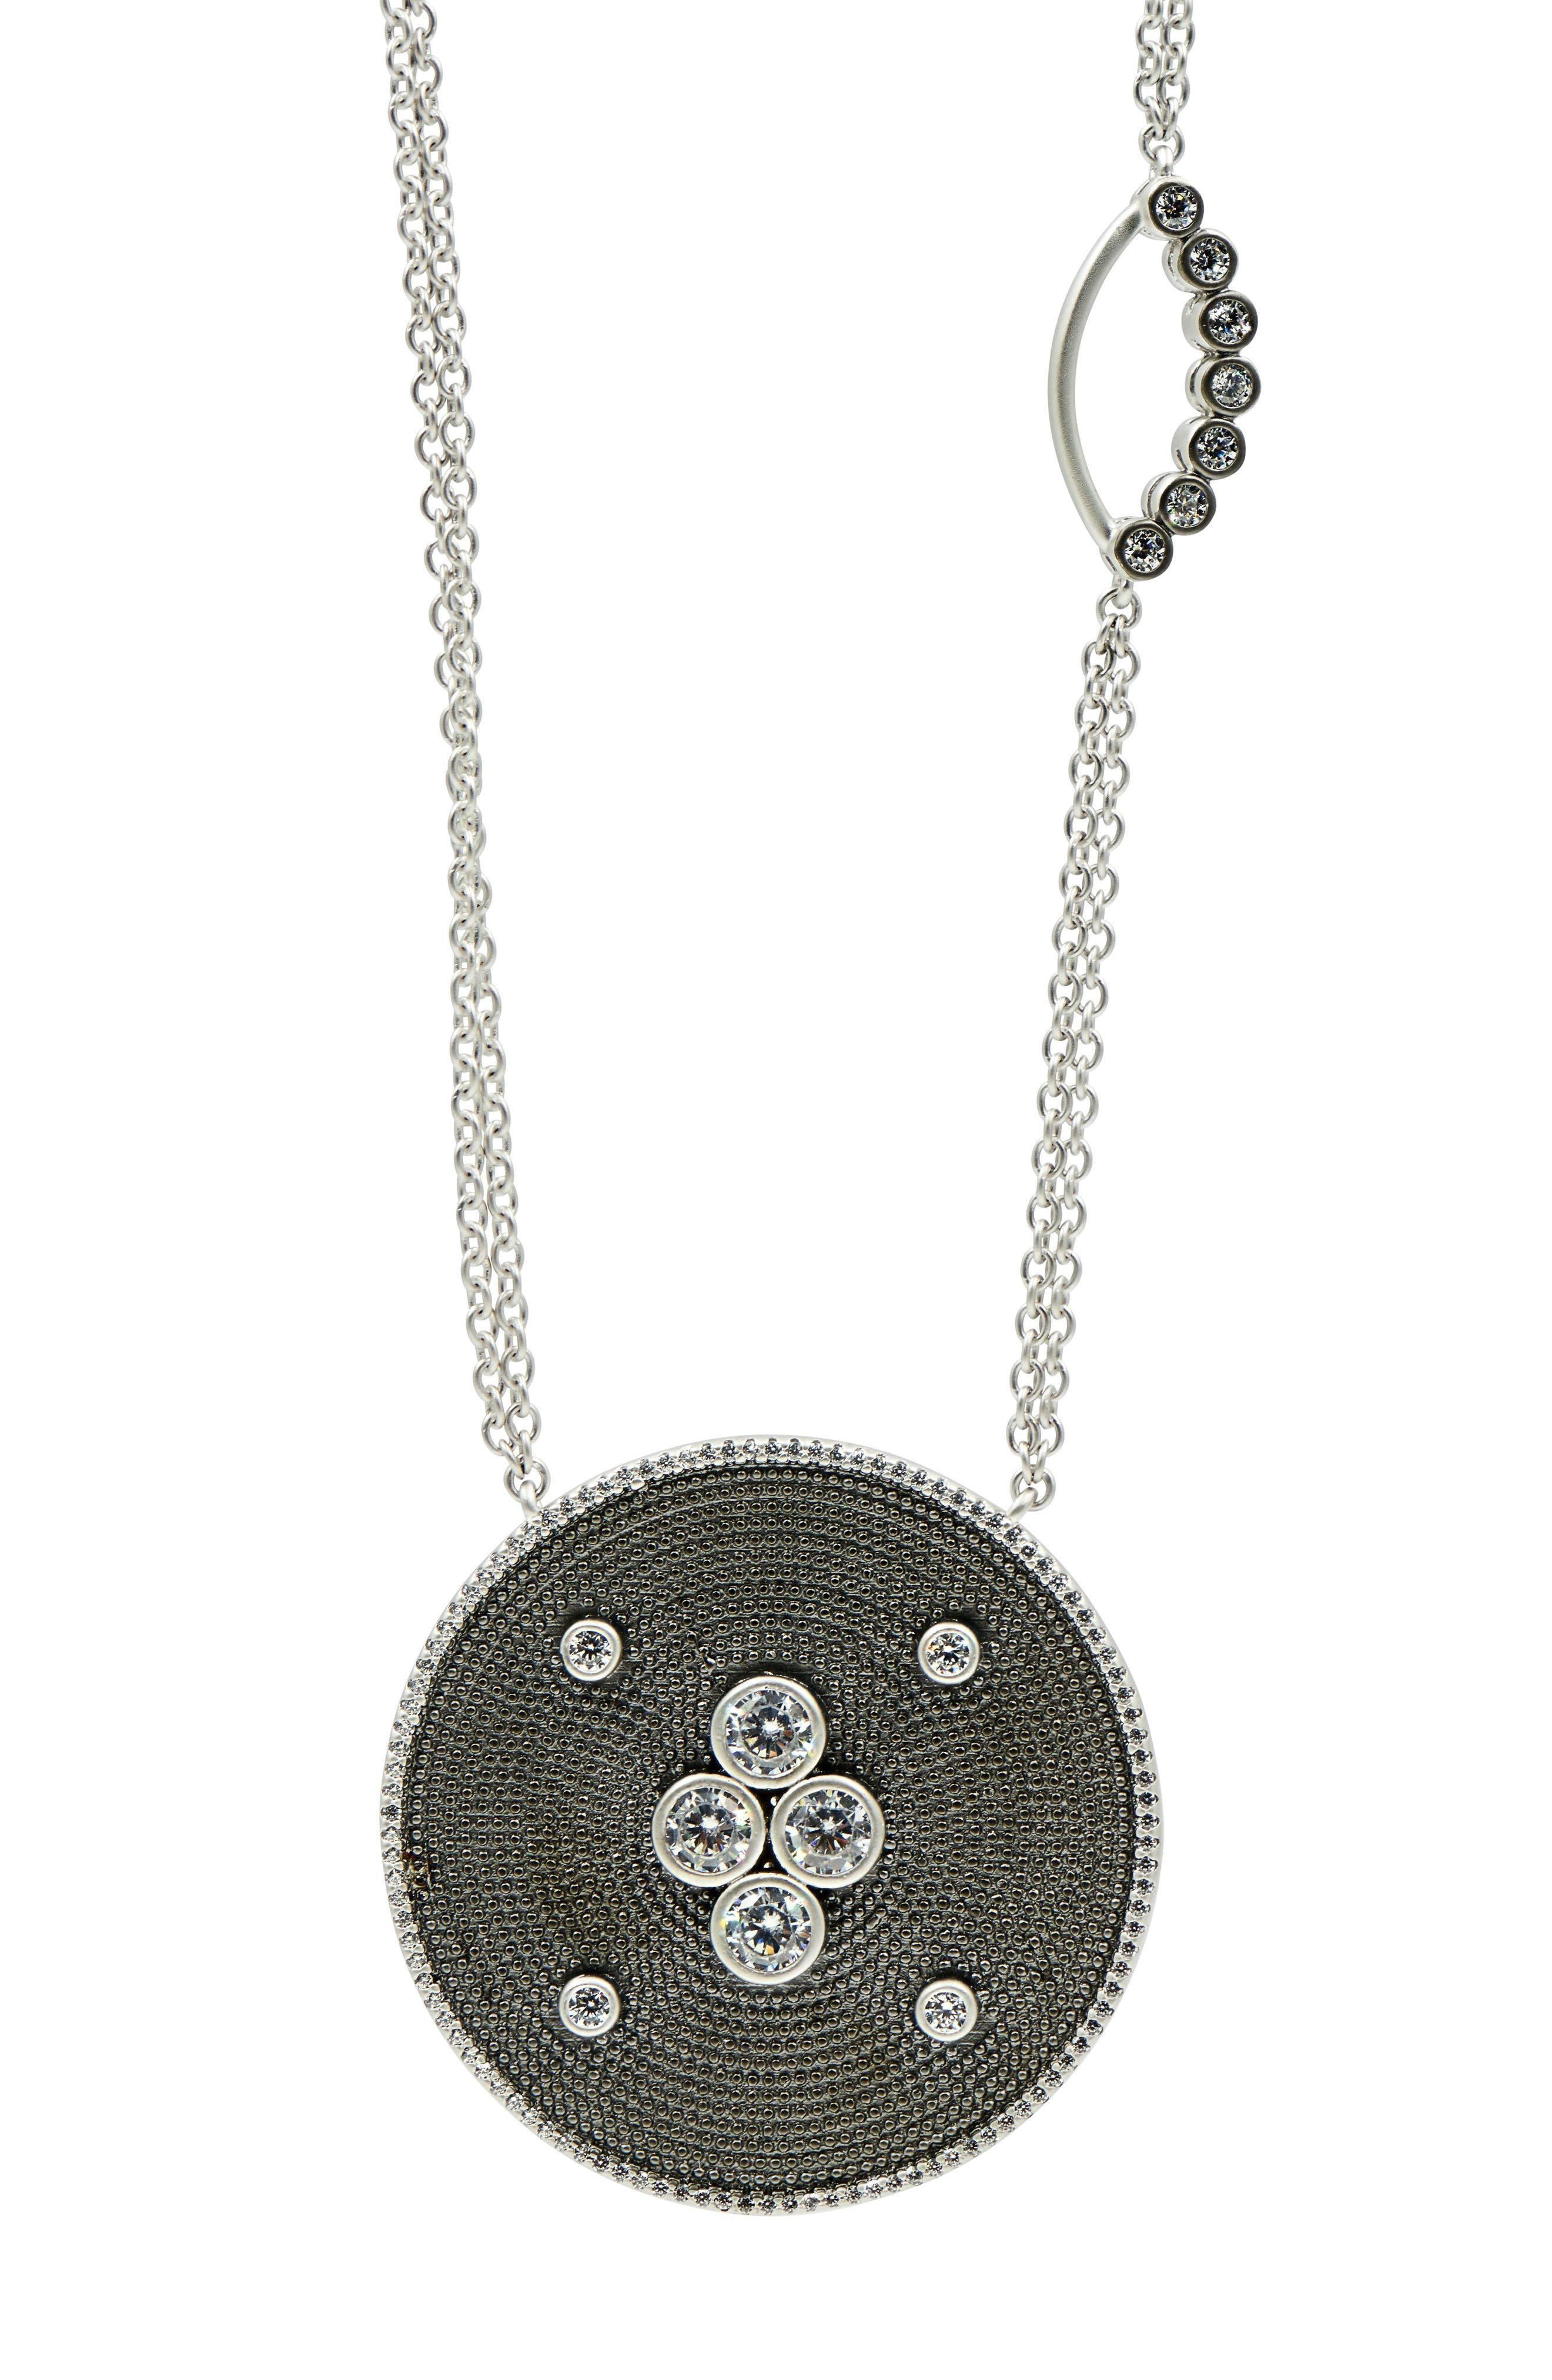 Industrial Finish Pendant Necklace,                             Alternate thumbnail 2, color,                             BLACK/ SILVER